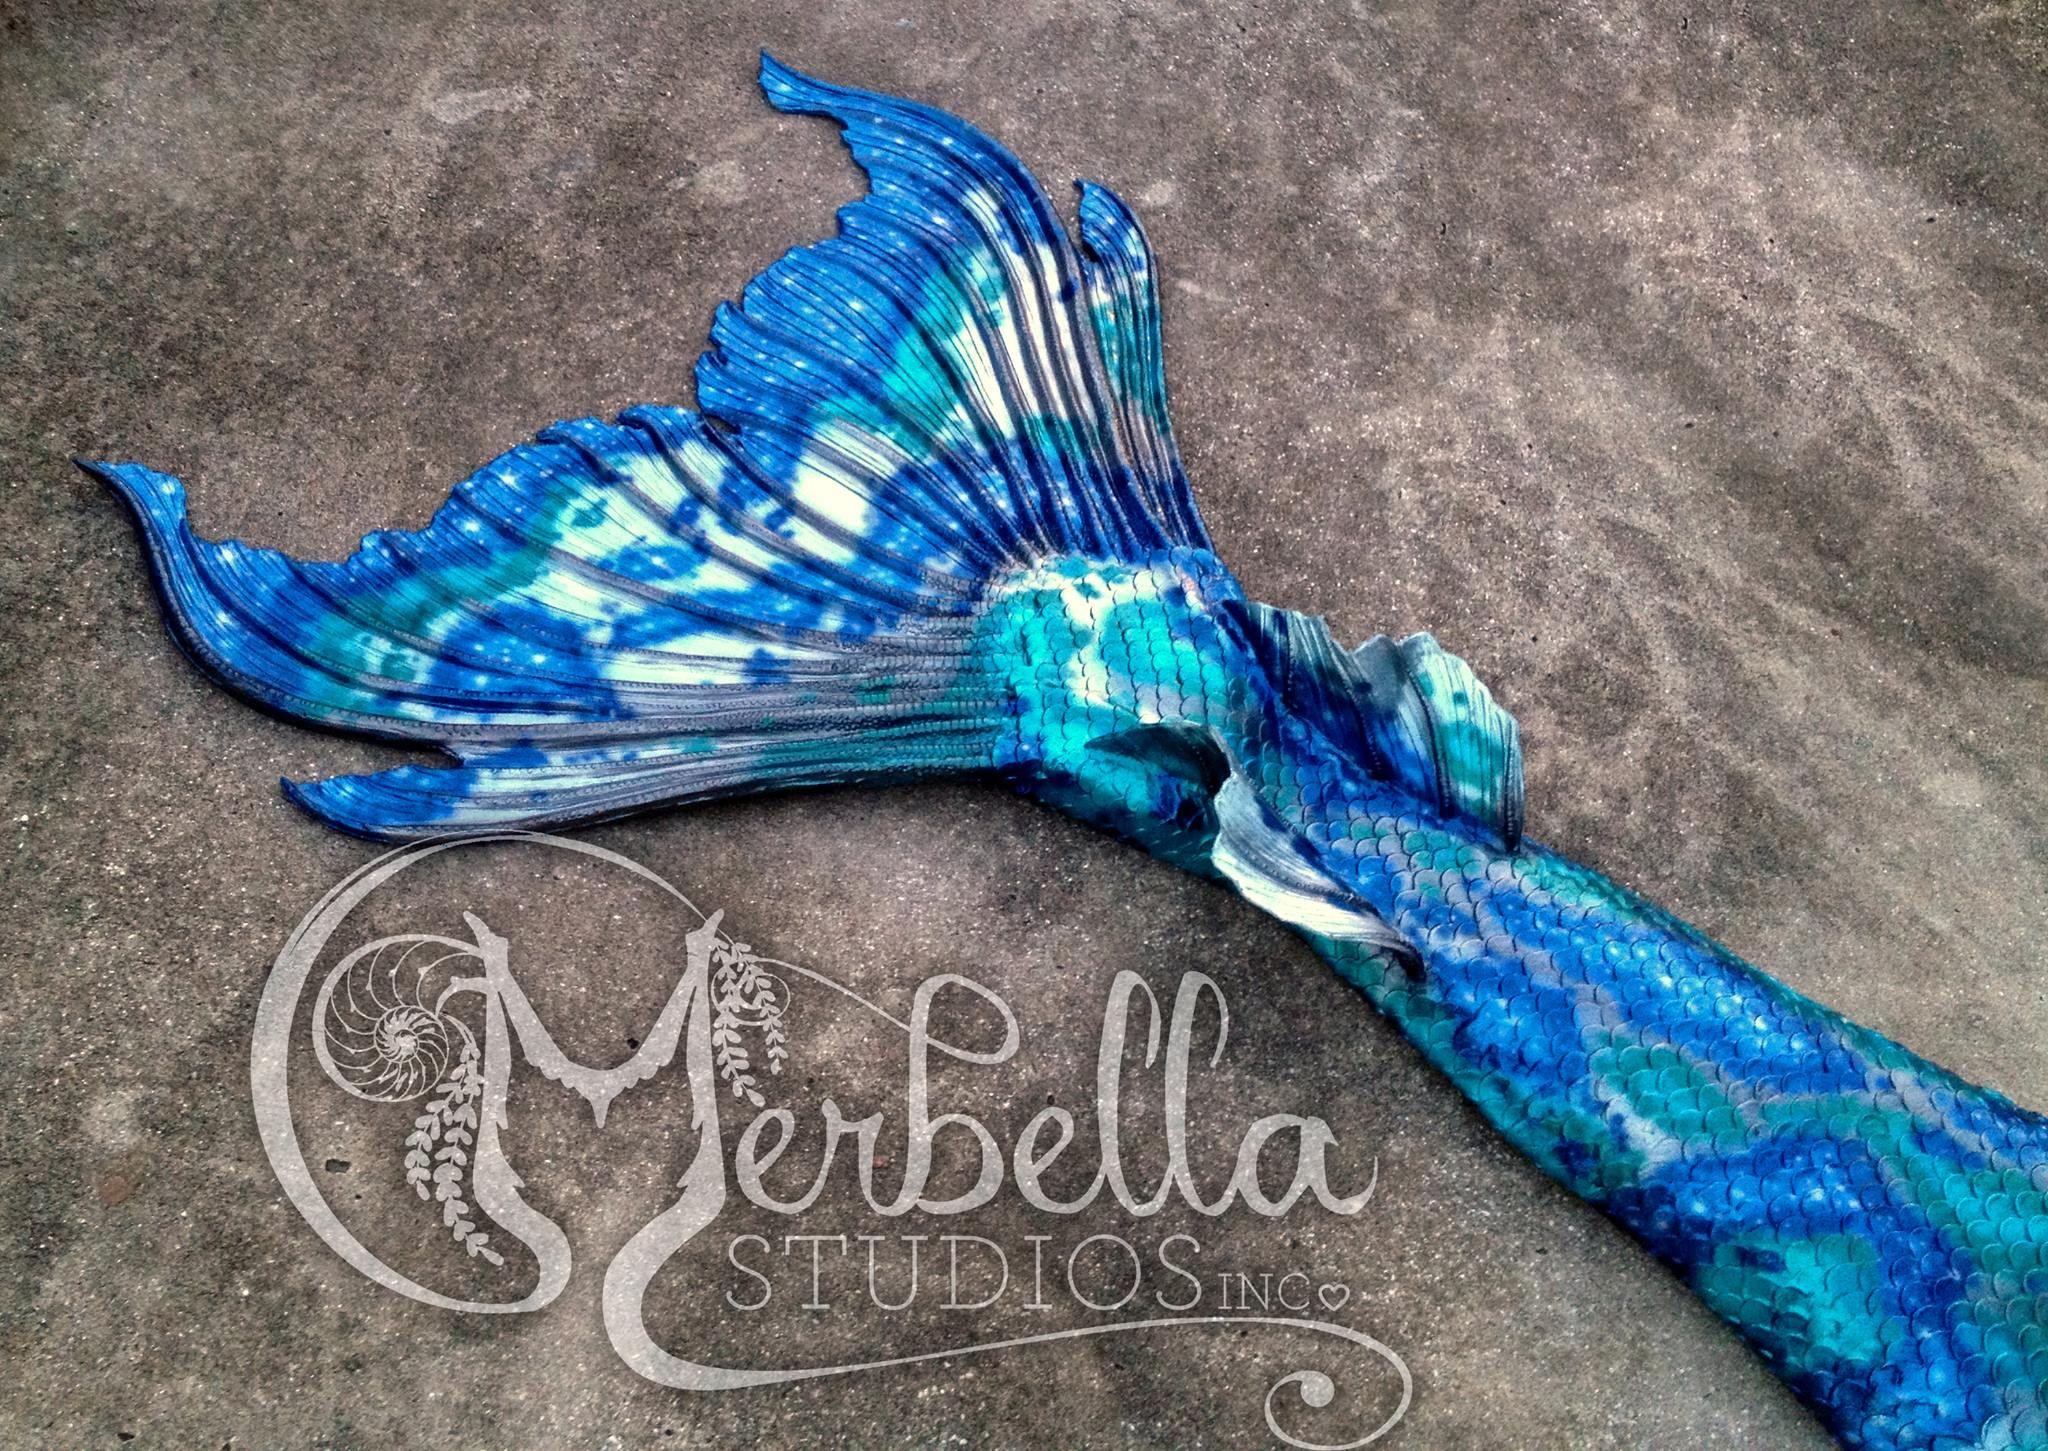 Image result for silicone mermaid tails merbella | существа ...